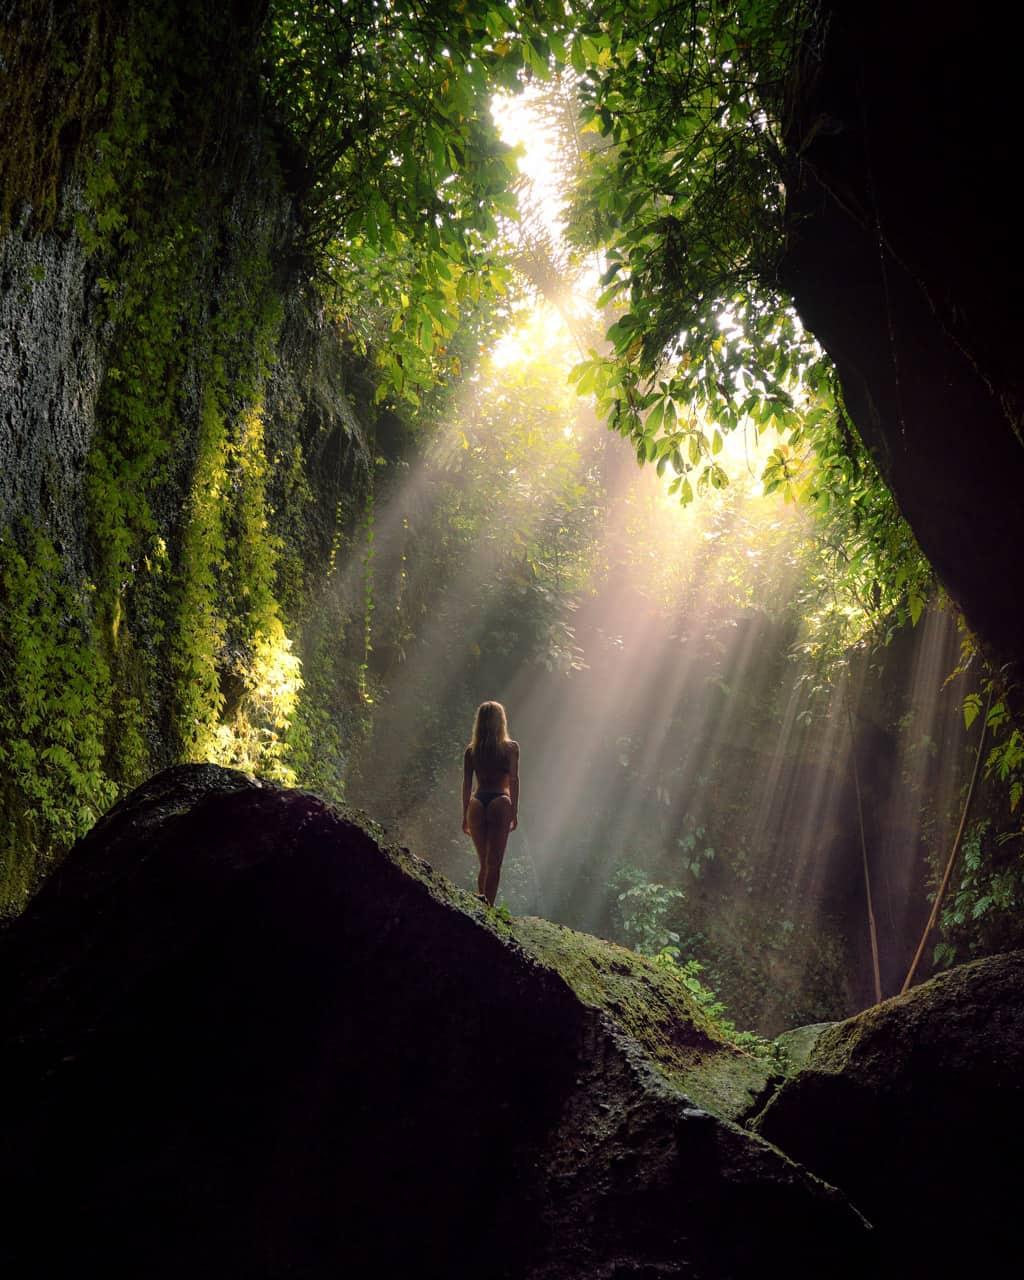 tukad-cepung-waterfall-bali-lightray-blog